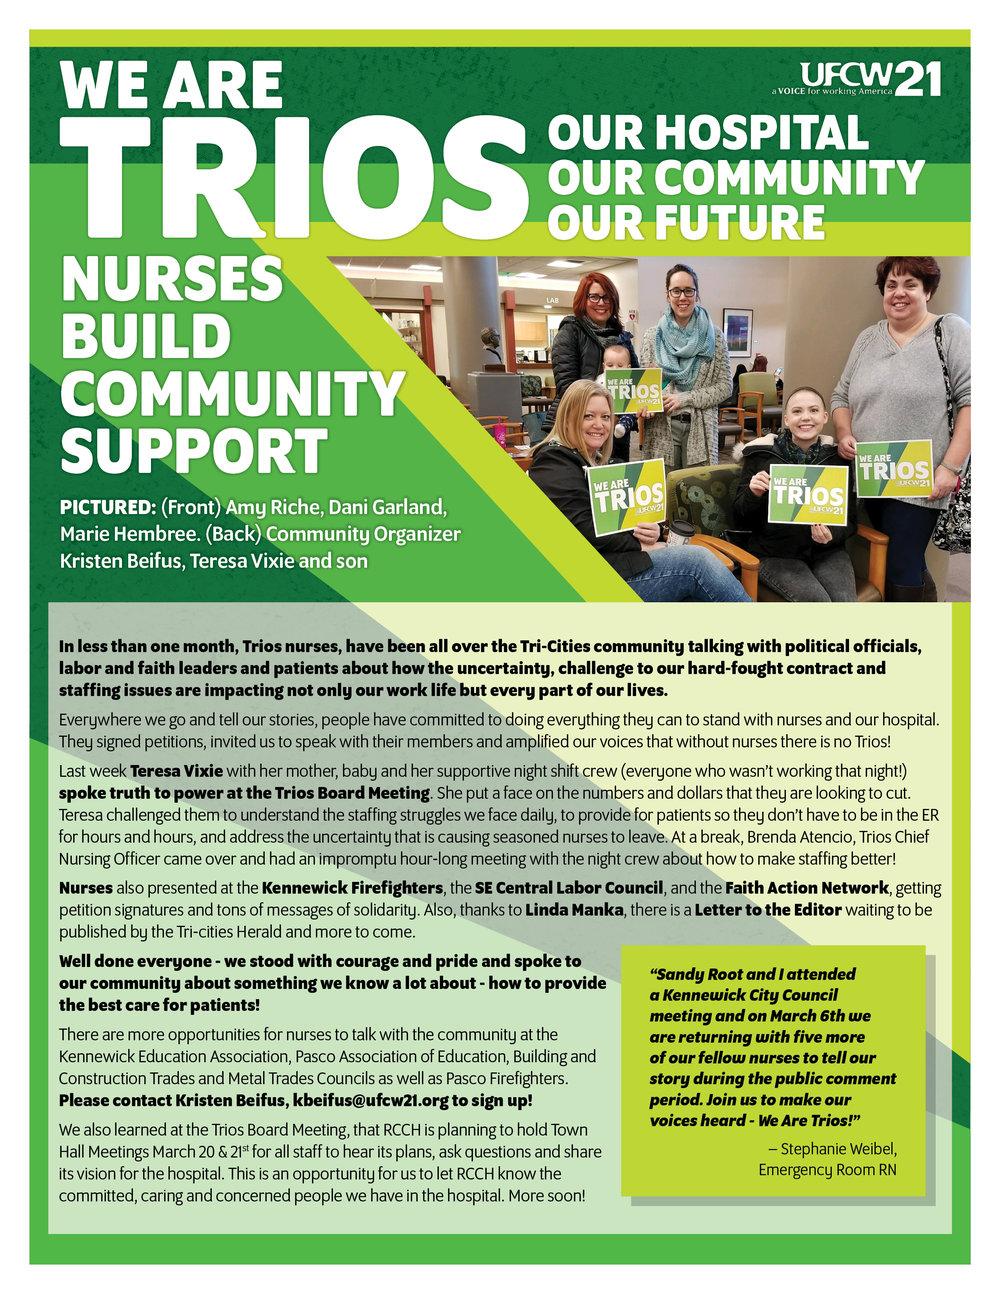 2018 0228 - Trios Update mailer.jpg